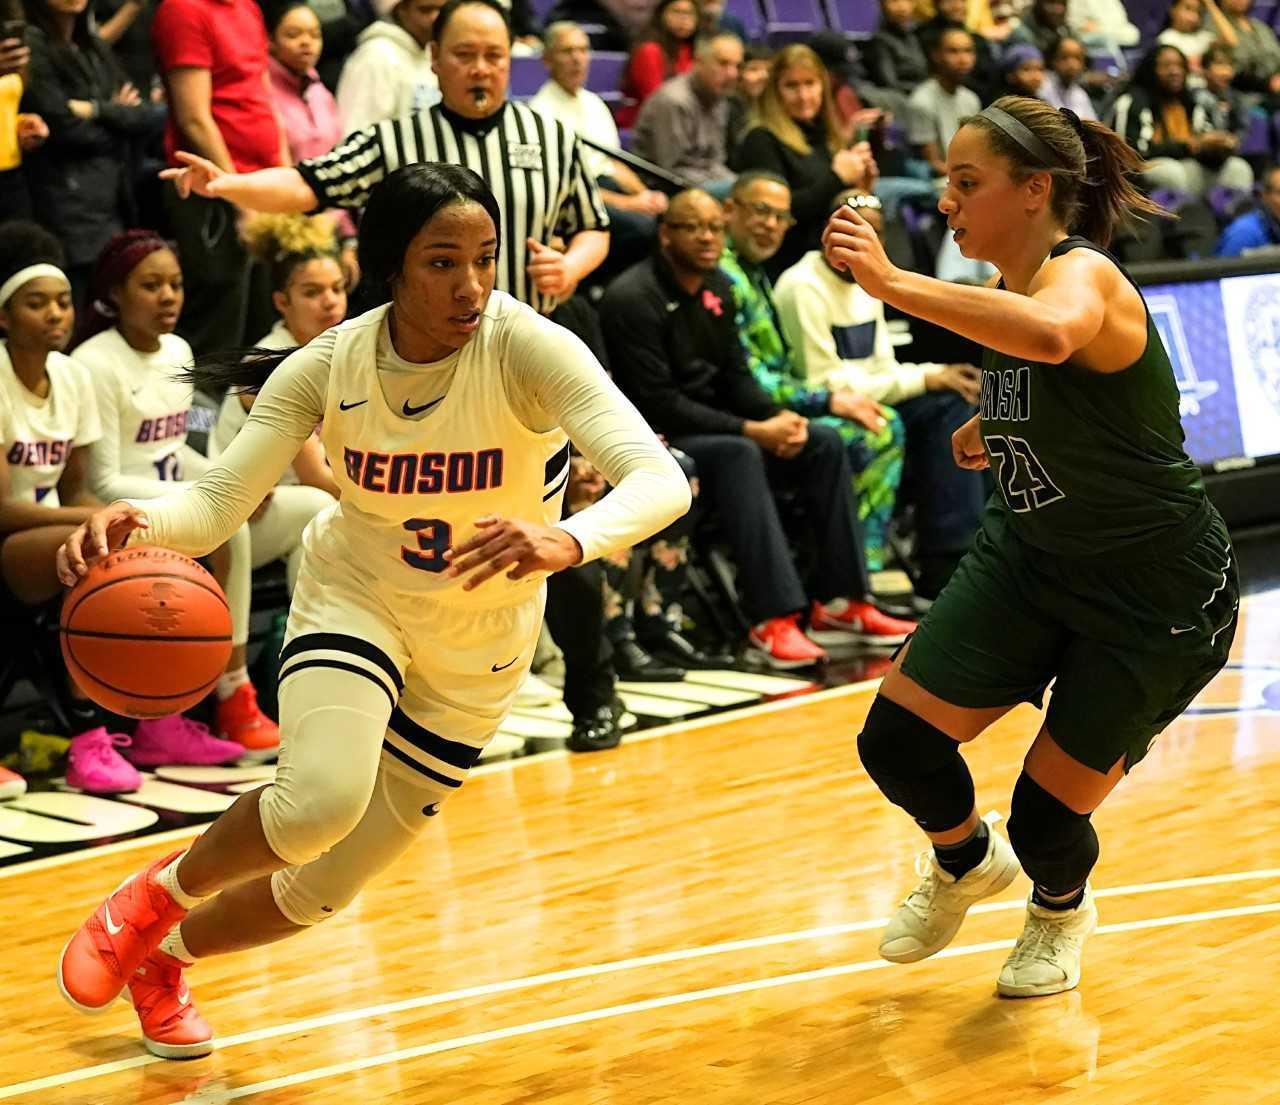 Benson's Ciera Ellington drives to the basket against Sheldon's Makayla Scurlock. (Photo by Jon Olson)